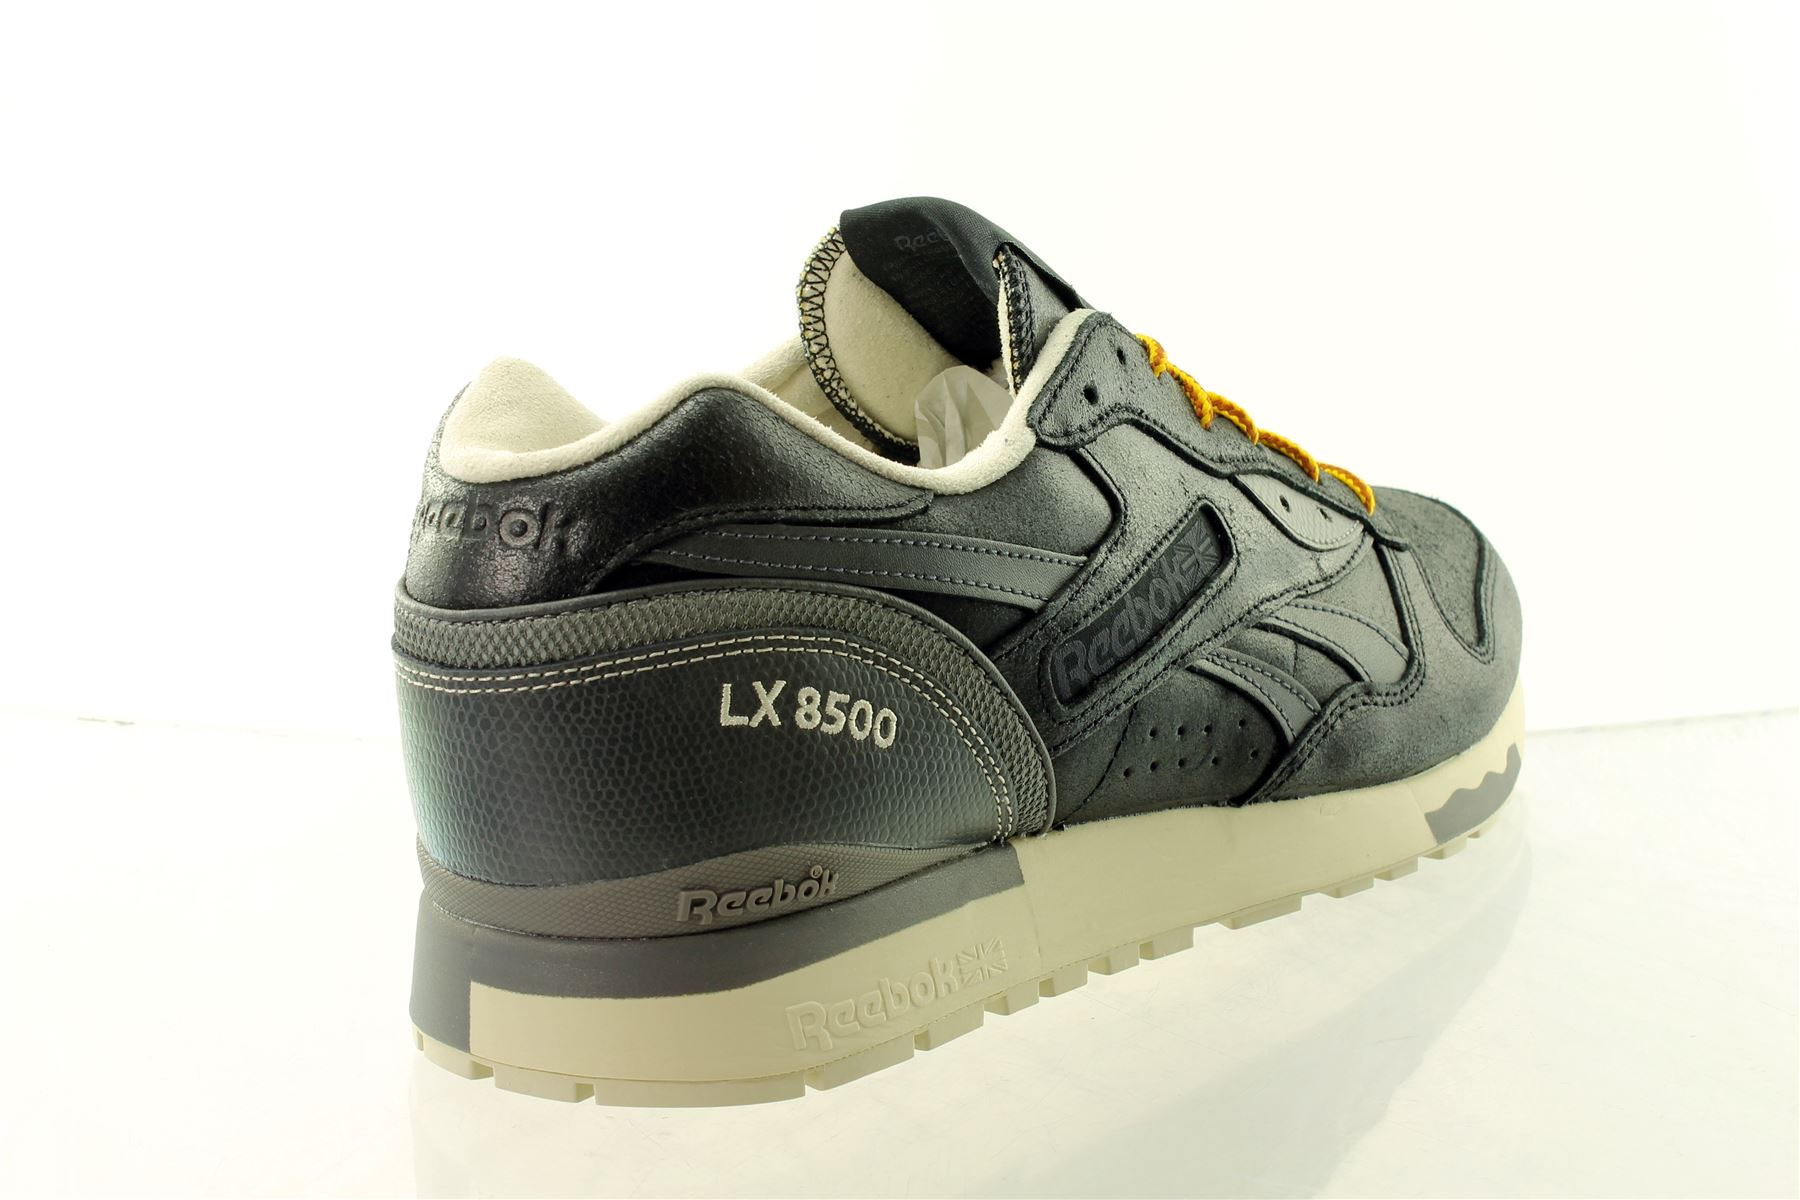 f557643eadb5 Reebok LX 8500 Premium Leather~Mens Trainers~RRP £75~UK 5.5 to 12 ...